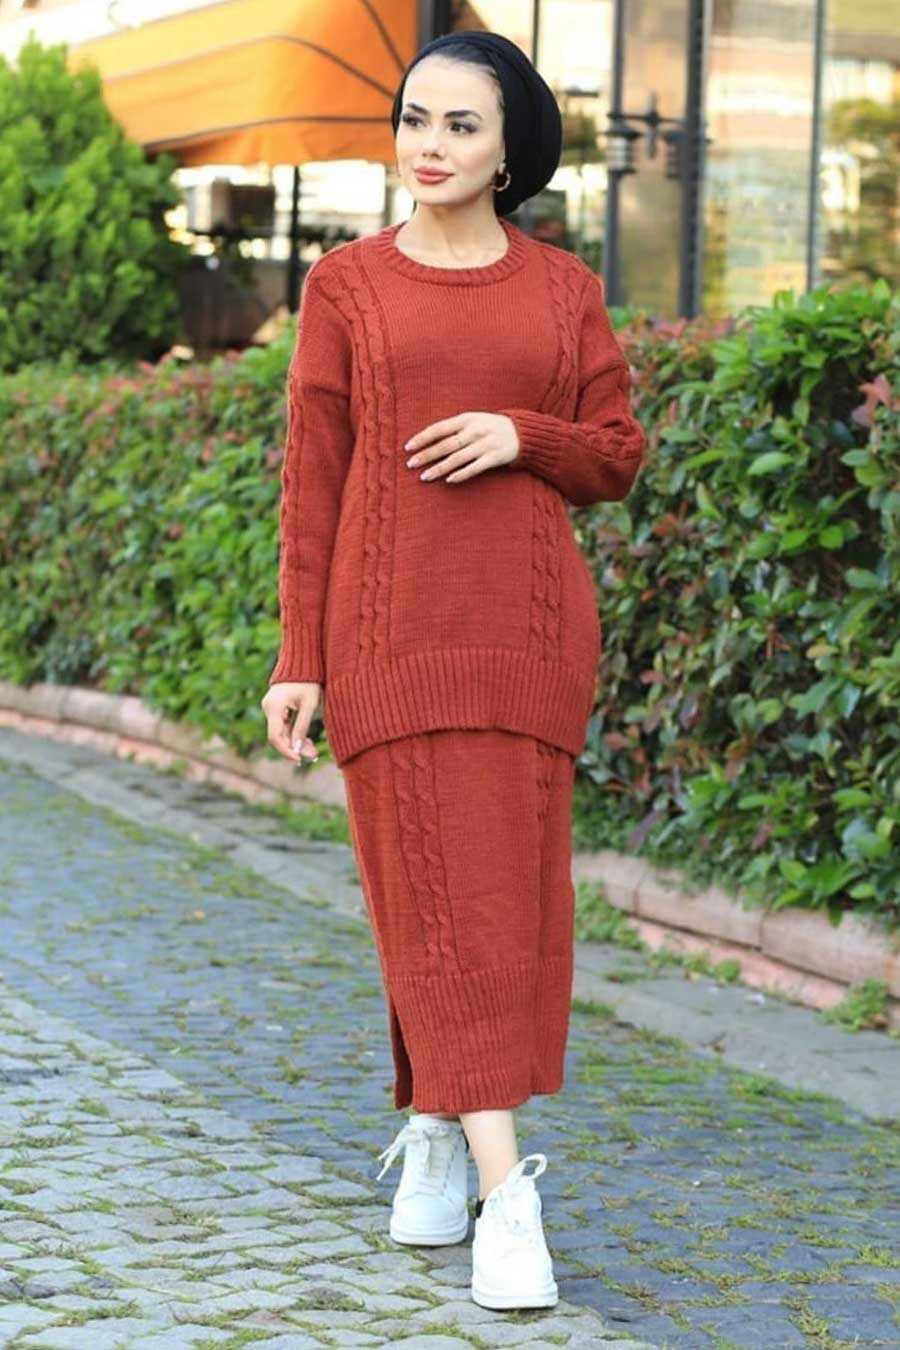 Terra Cotta Hijab Knitwear Suit 6010KRMT